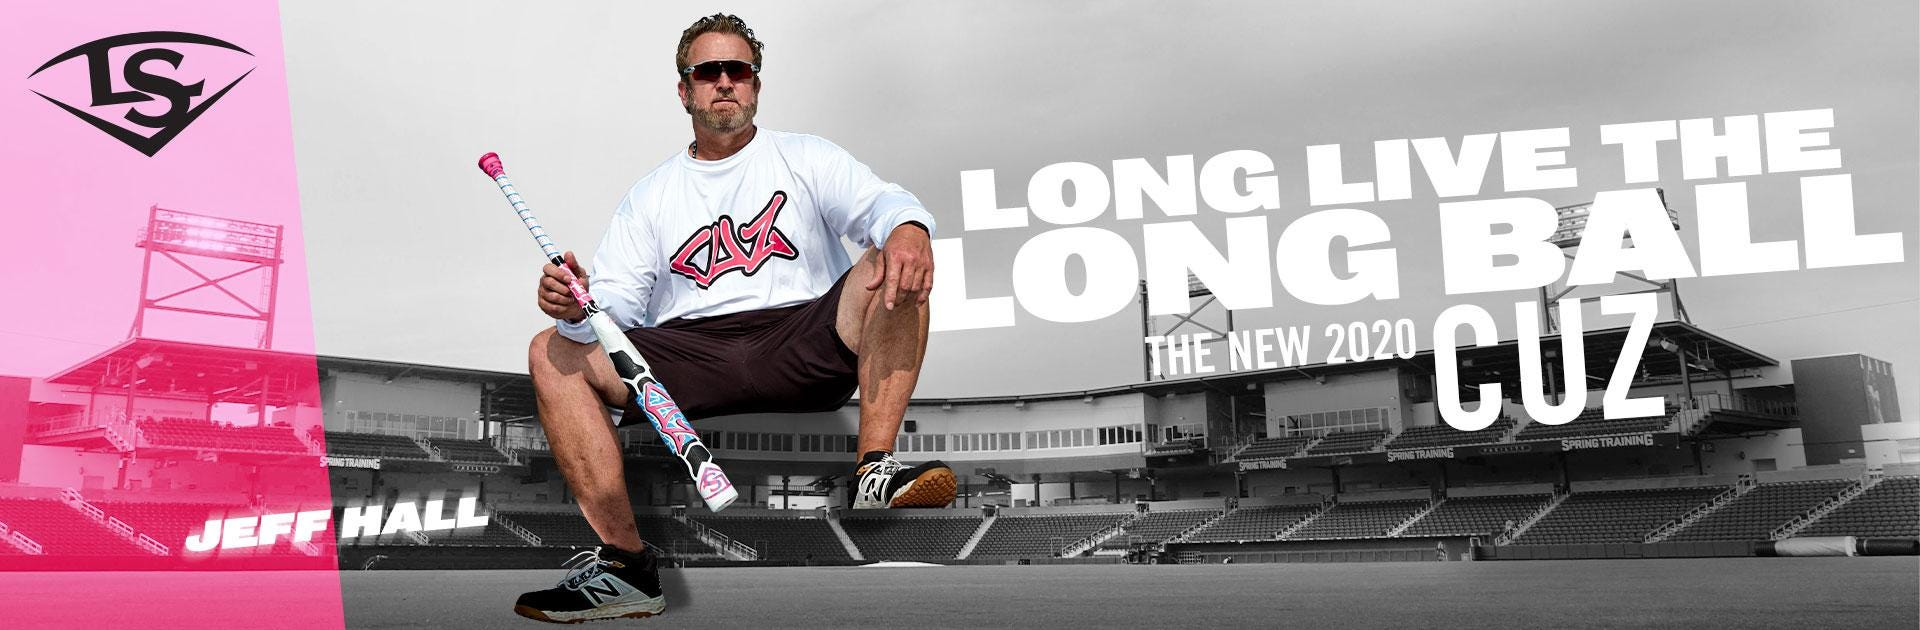 Long Live the Long Ball. The new 2020 CUZ Slowpitch softball bat.